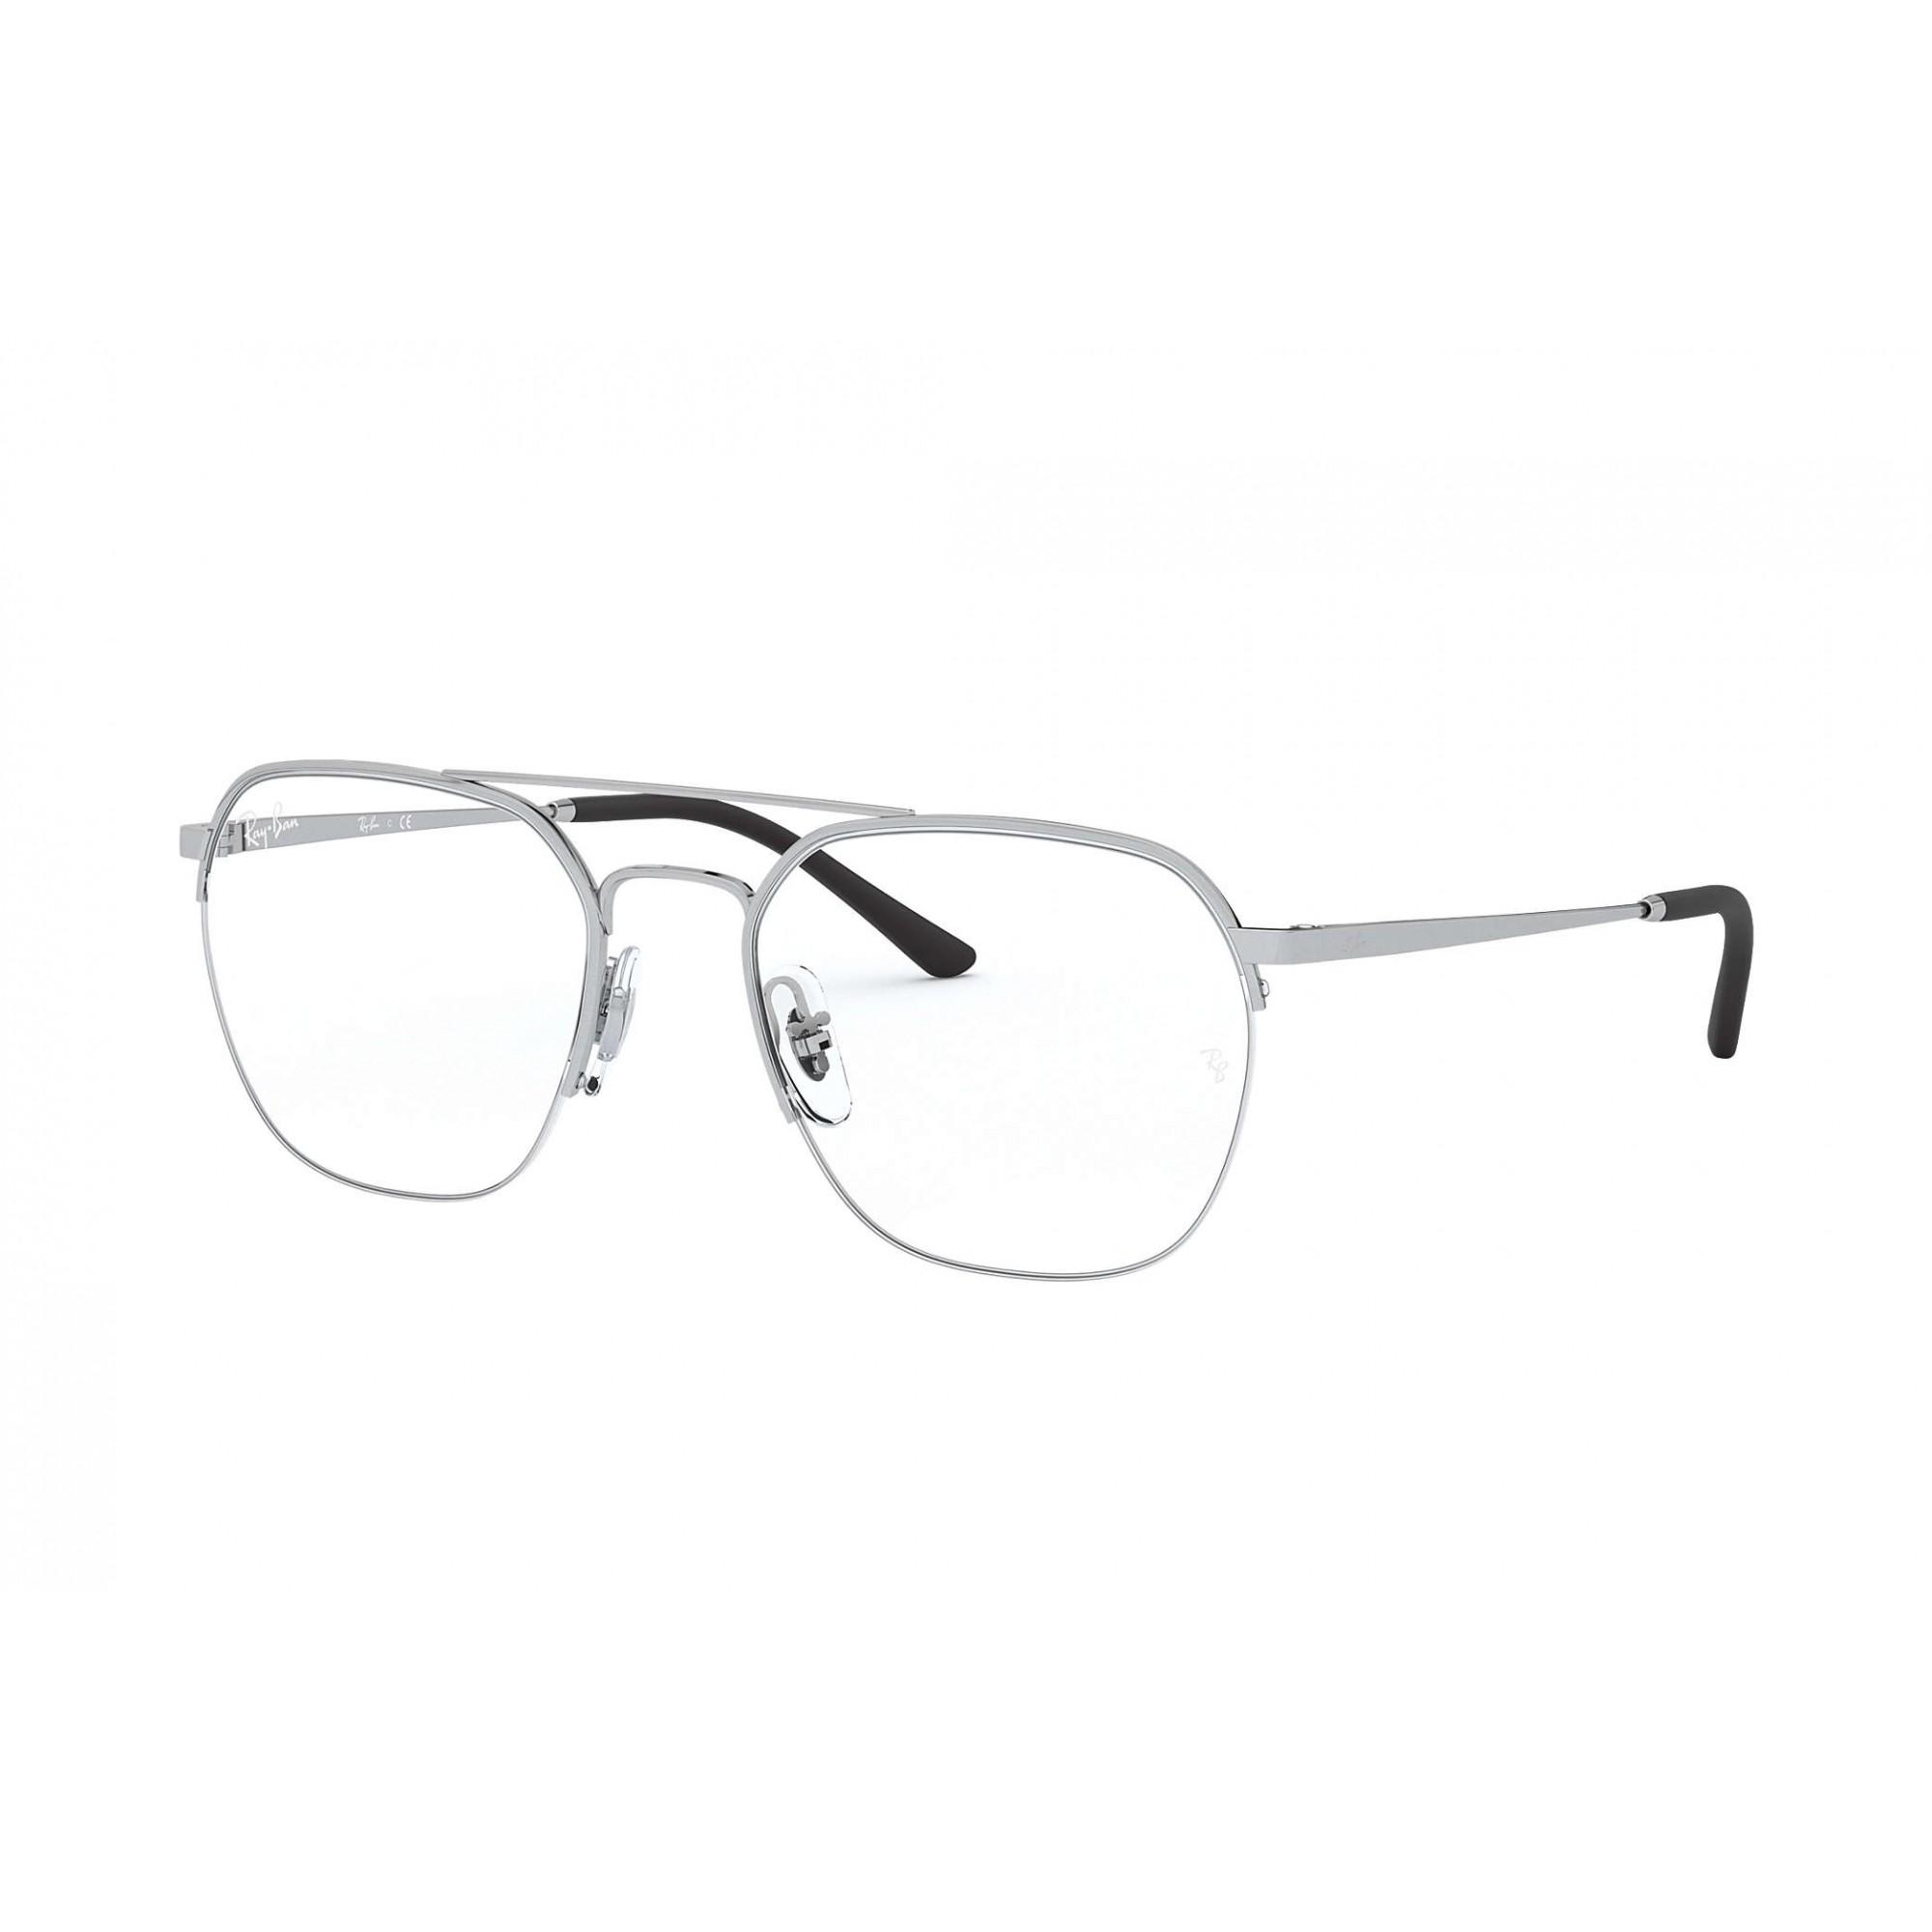 Óculos de Grau Ray-Ban Prata RB6444 - 2501/53